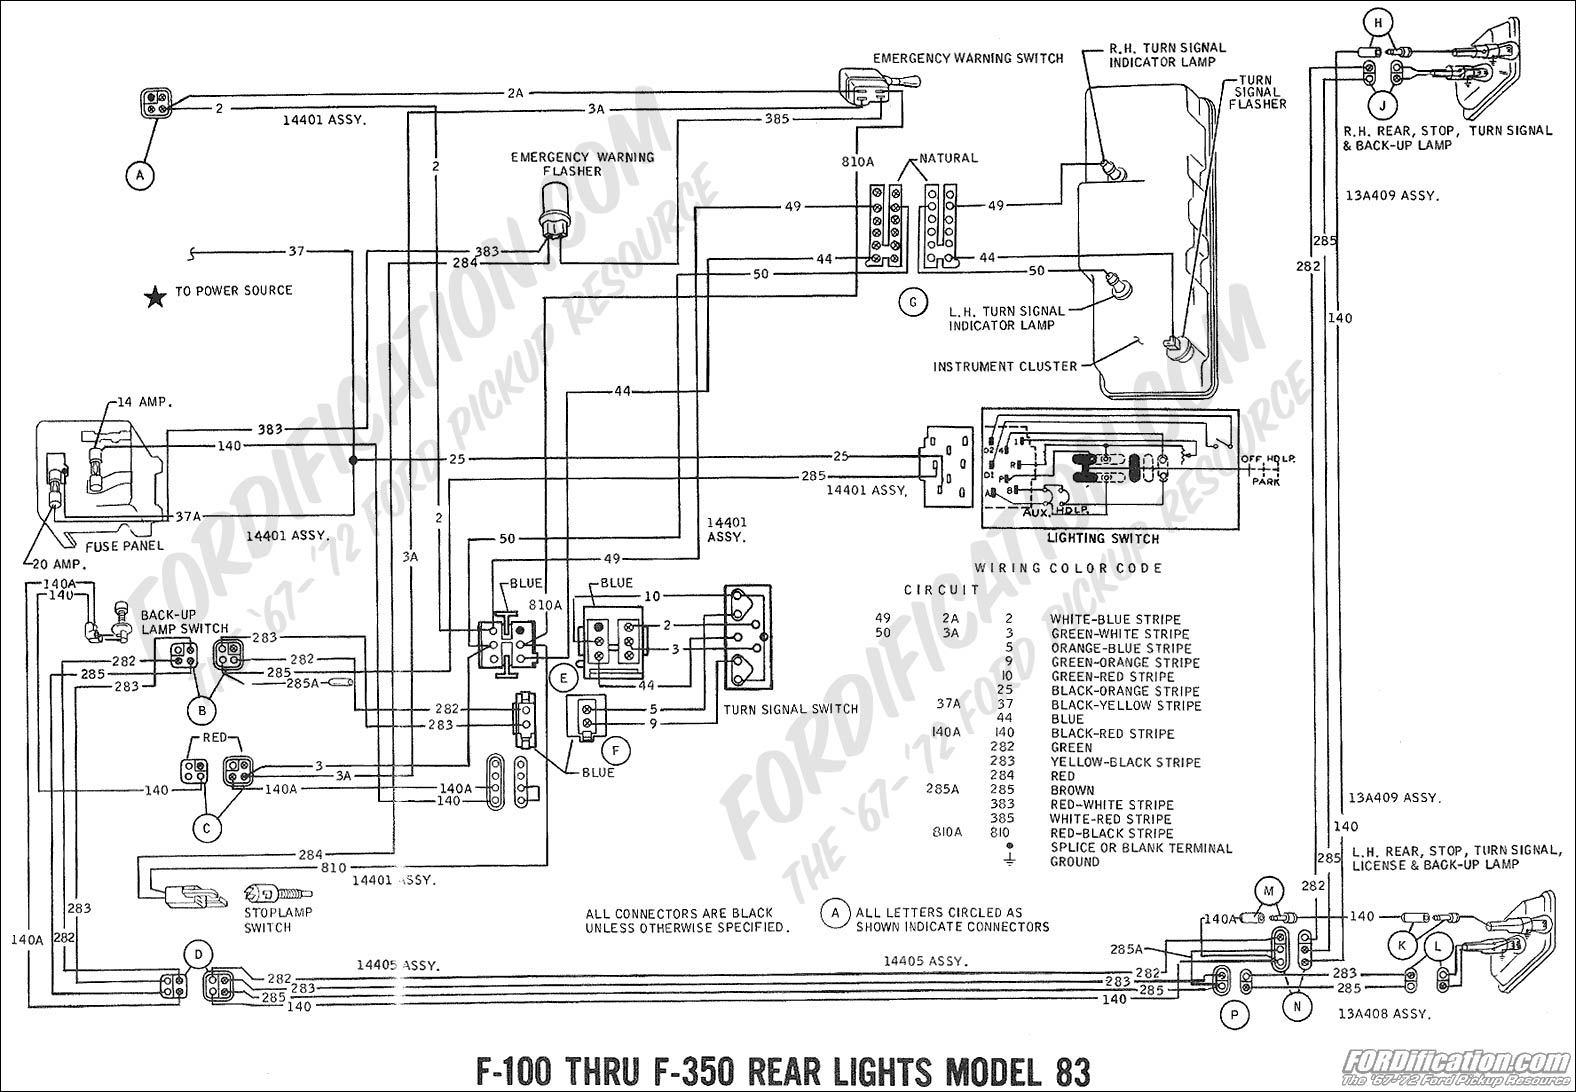 1975 ford f250 wiring diagram trailer 4 way flat 1966 f 100 turn signal parts